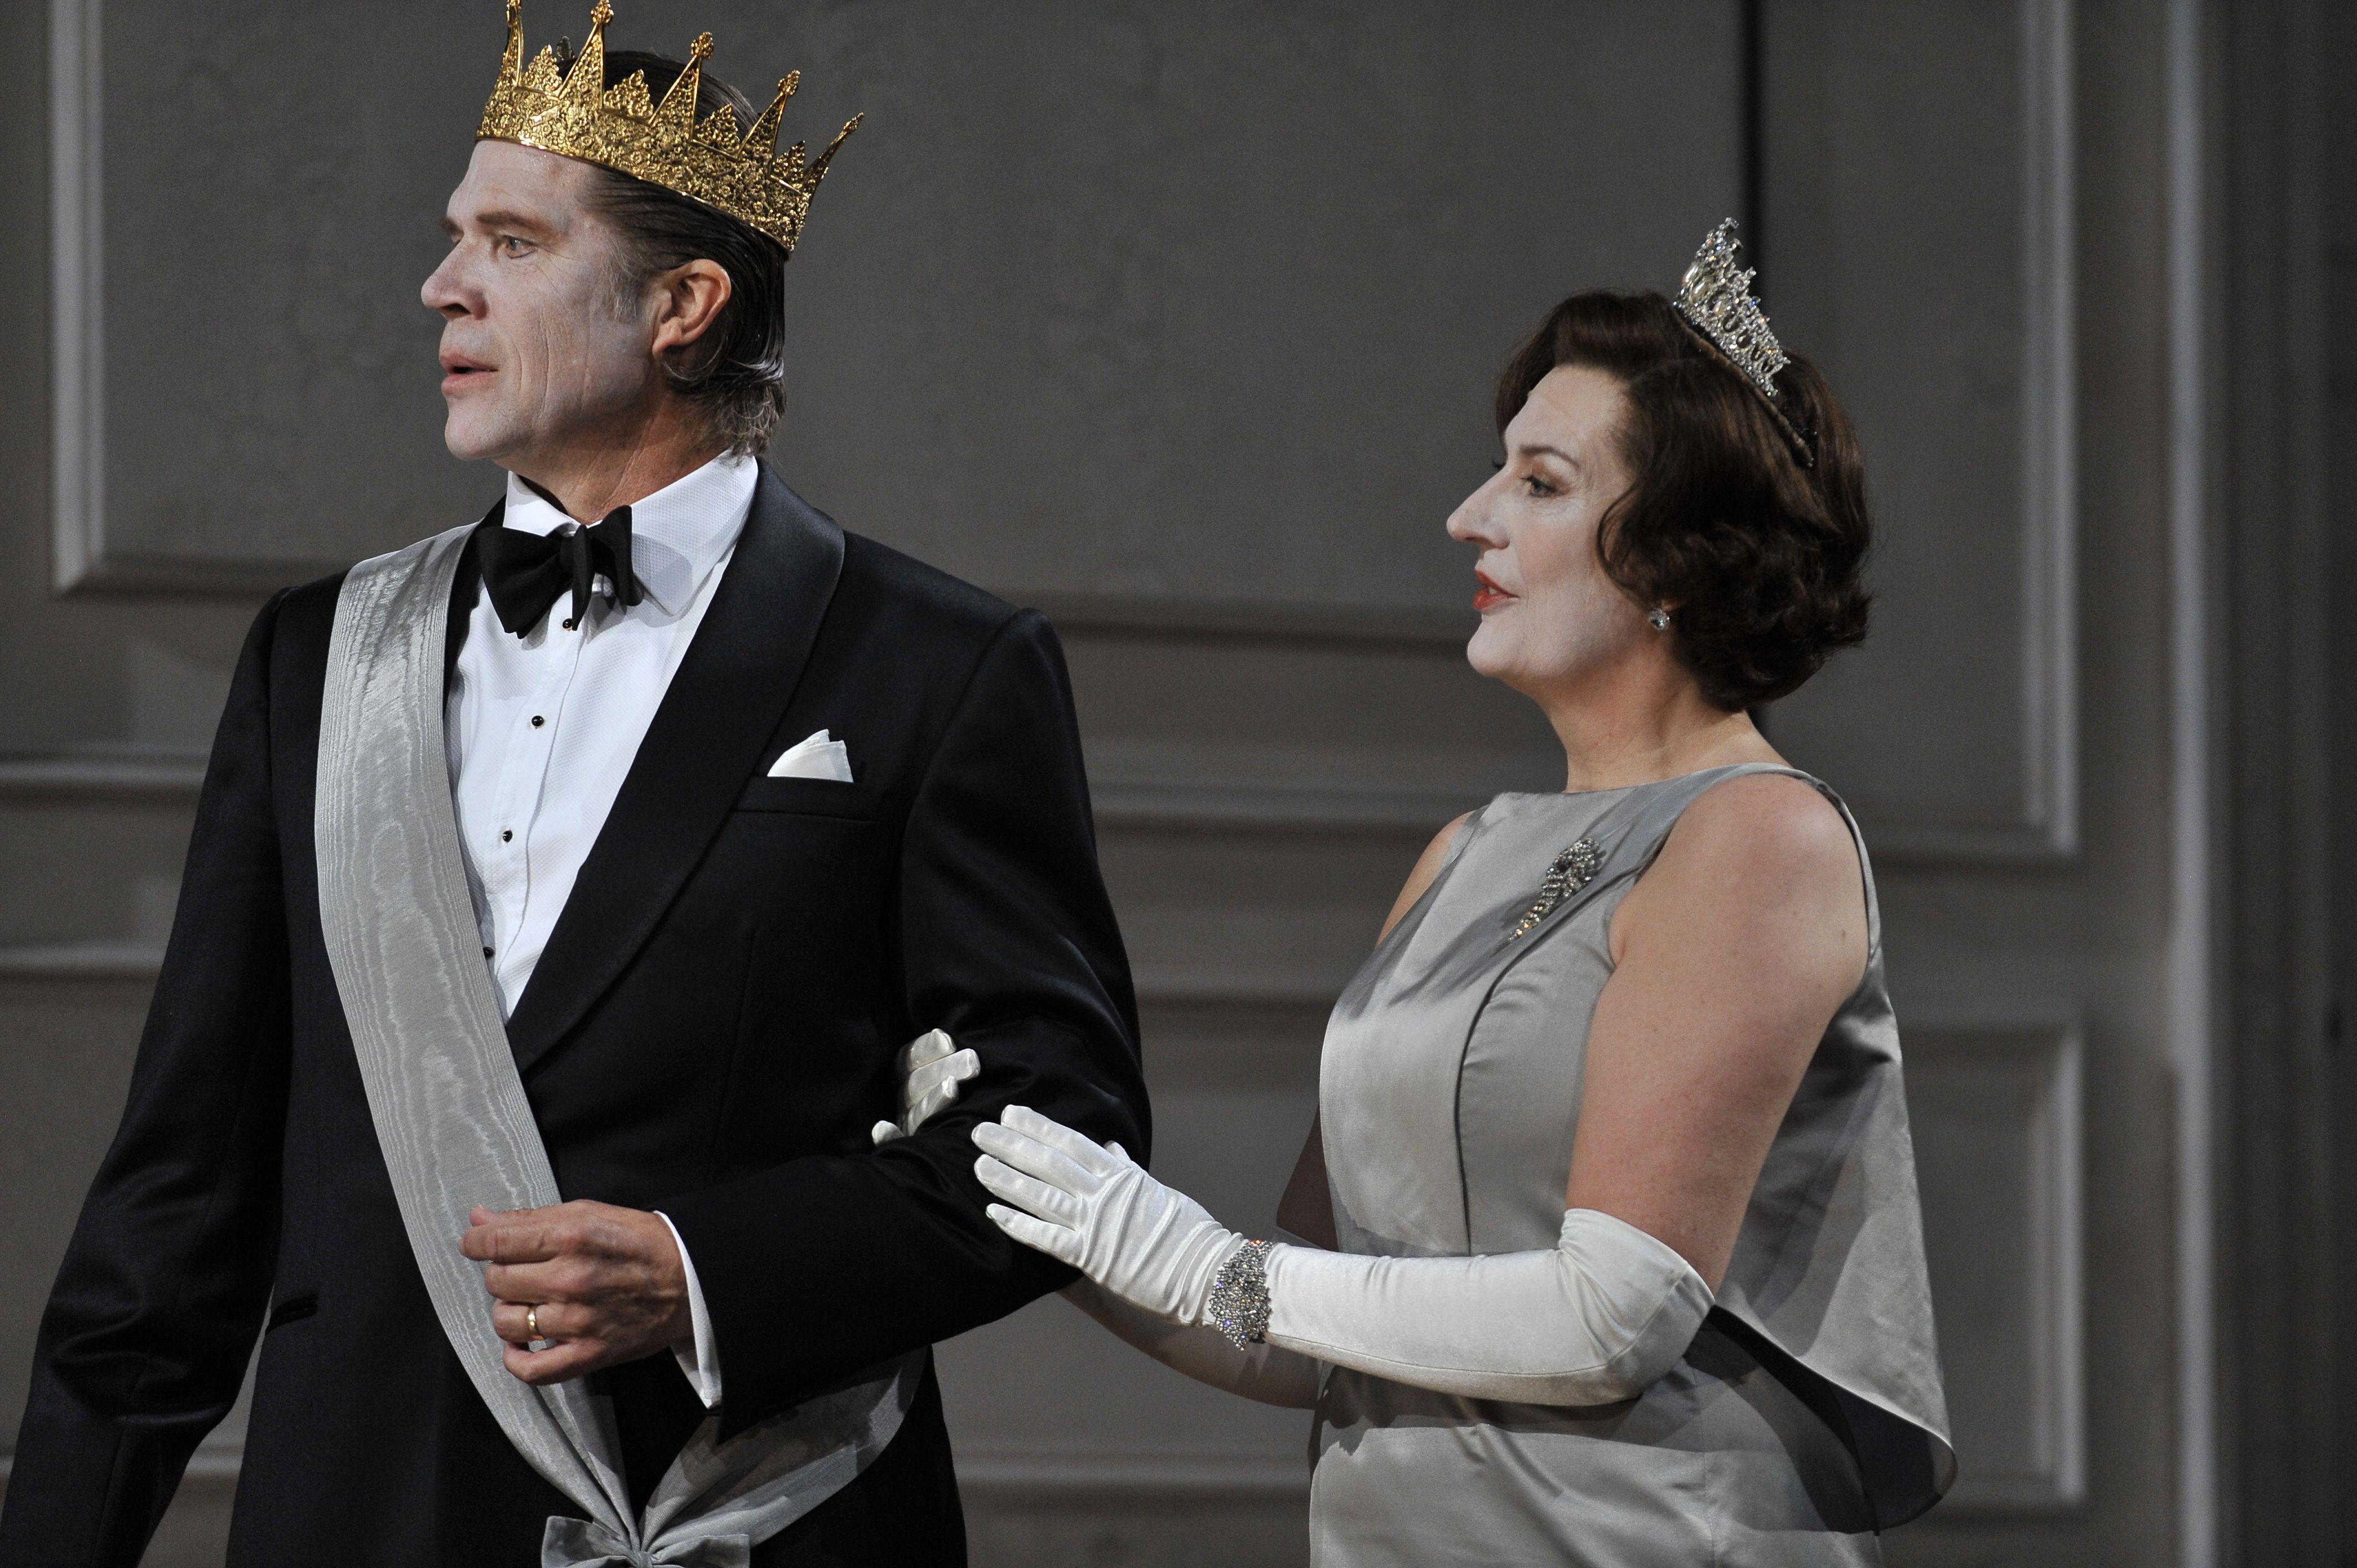 Rod Gilfry as Claudius and Sarah Connolly as Gertrude.